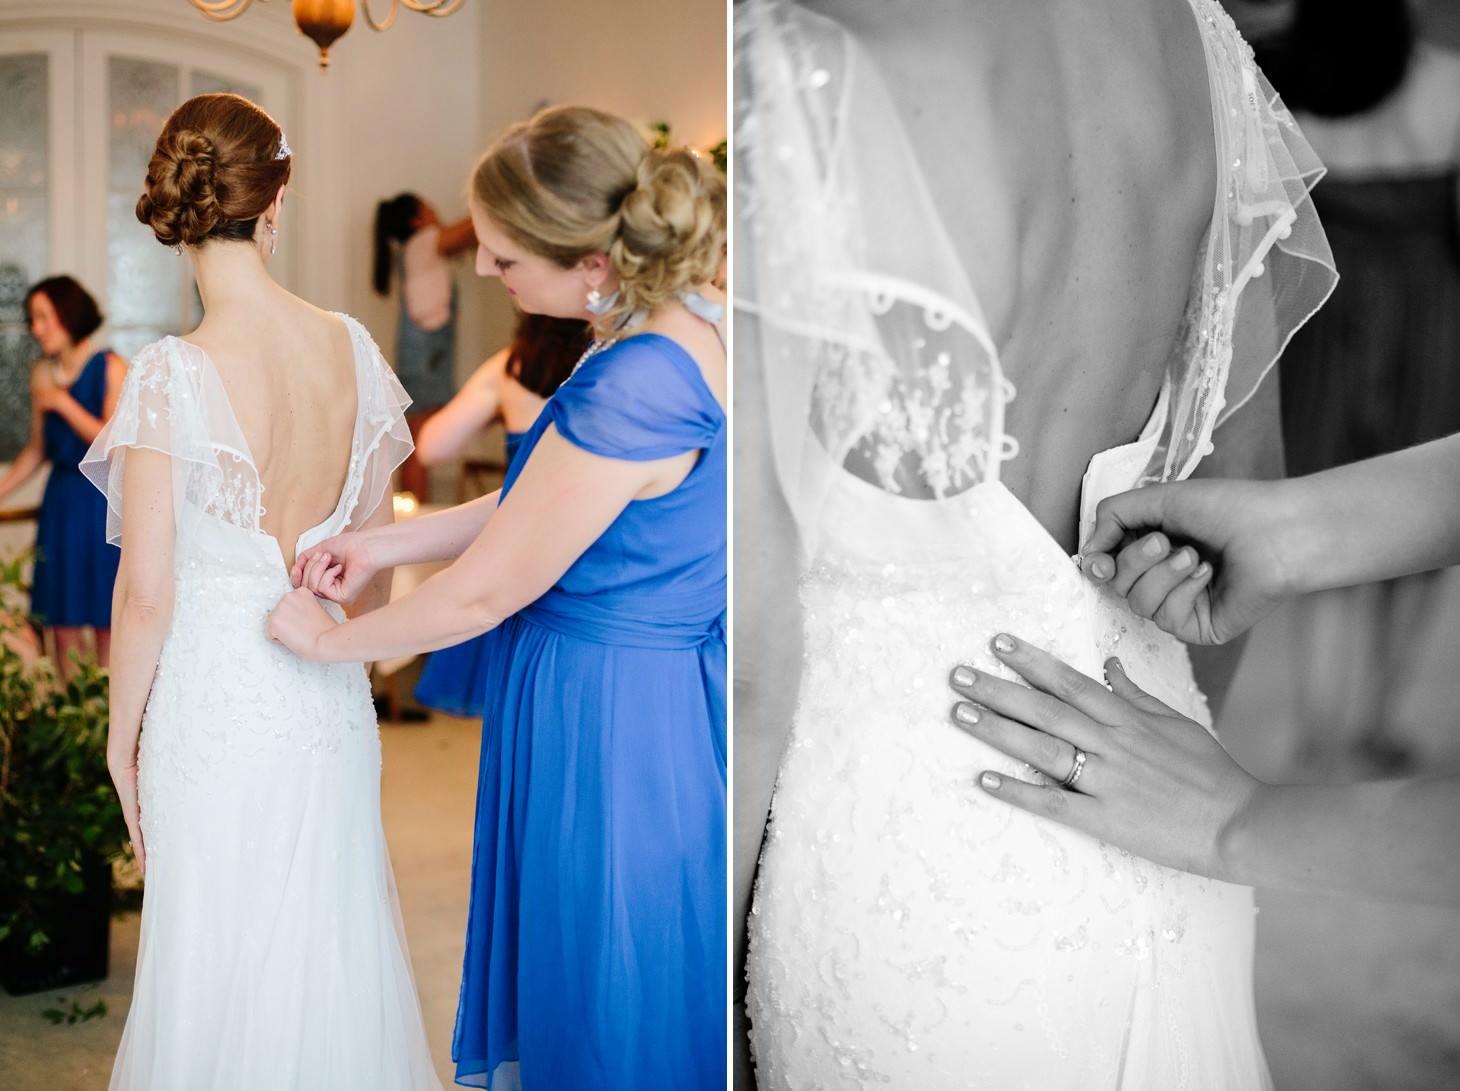 005-nyc-wedding-photographer-brooklyn-restaurant-2.jpg